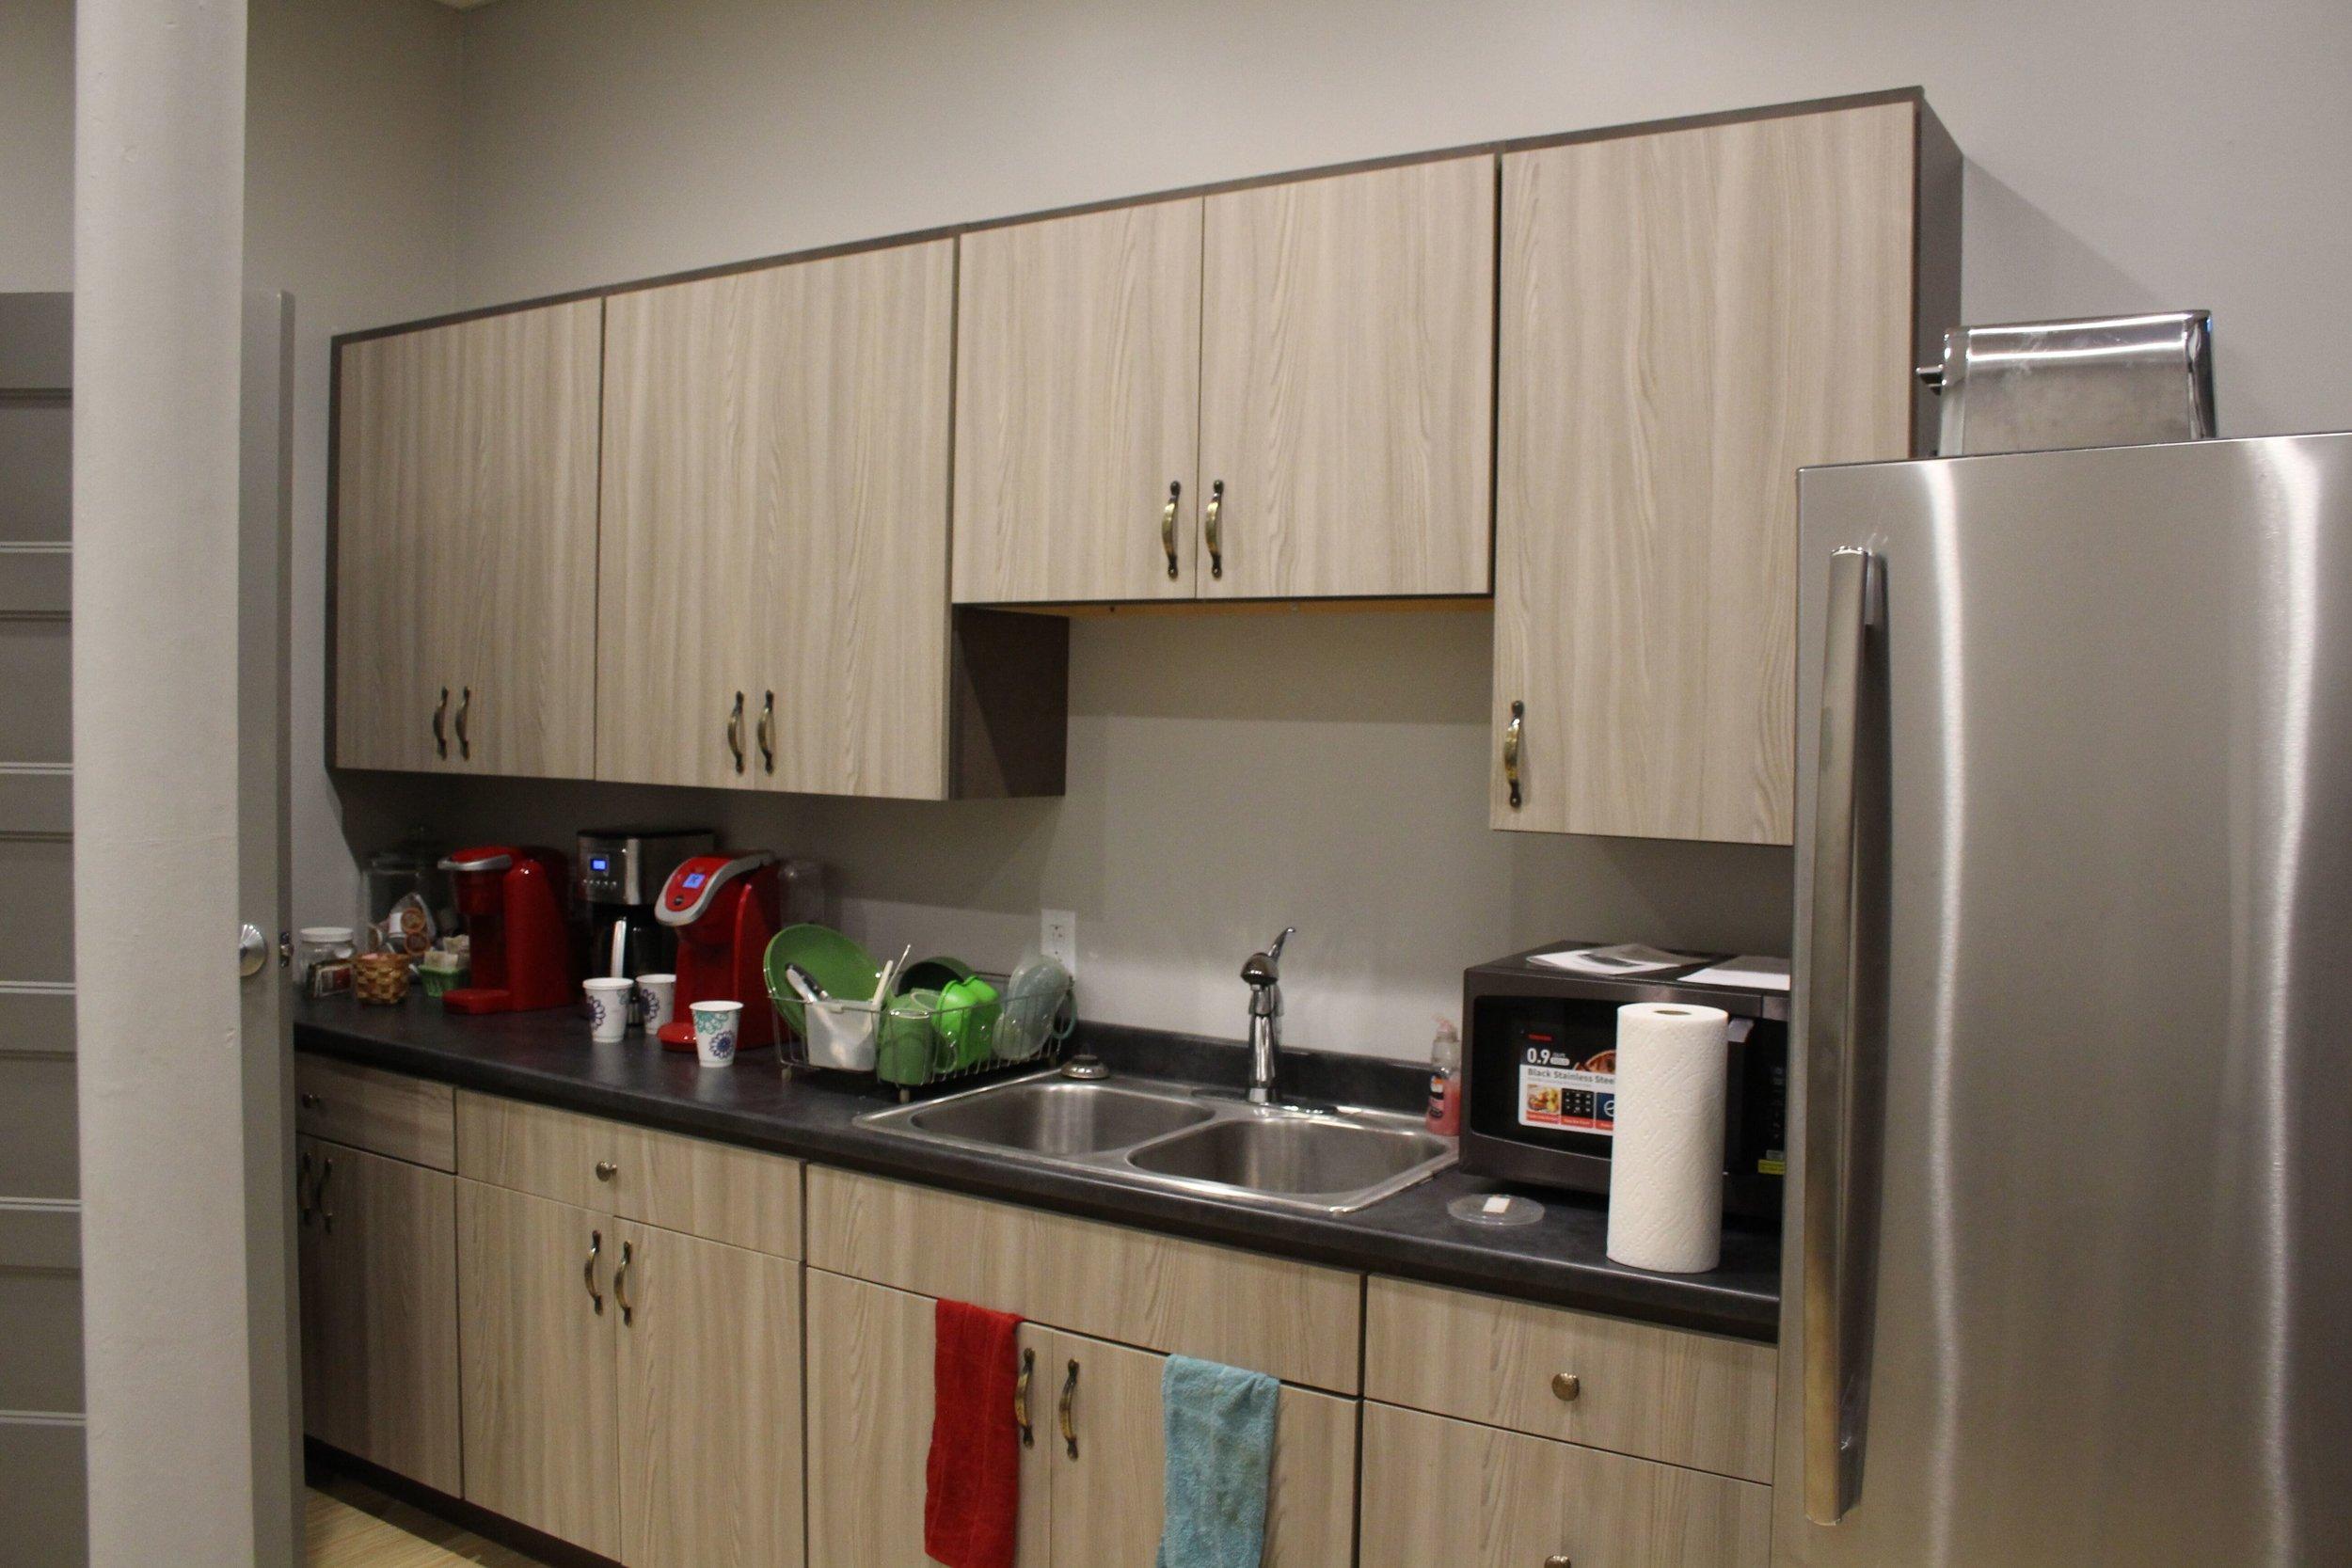 90 Main Kitchen.jpeg